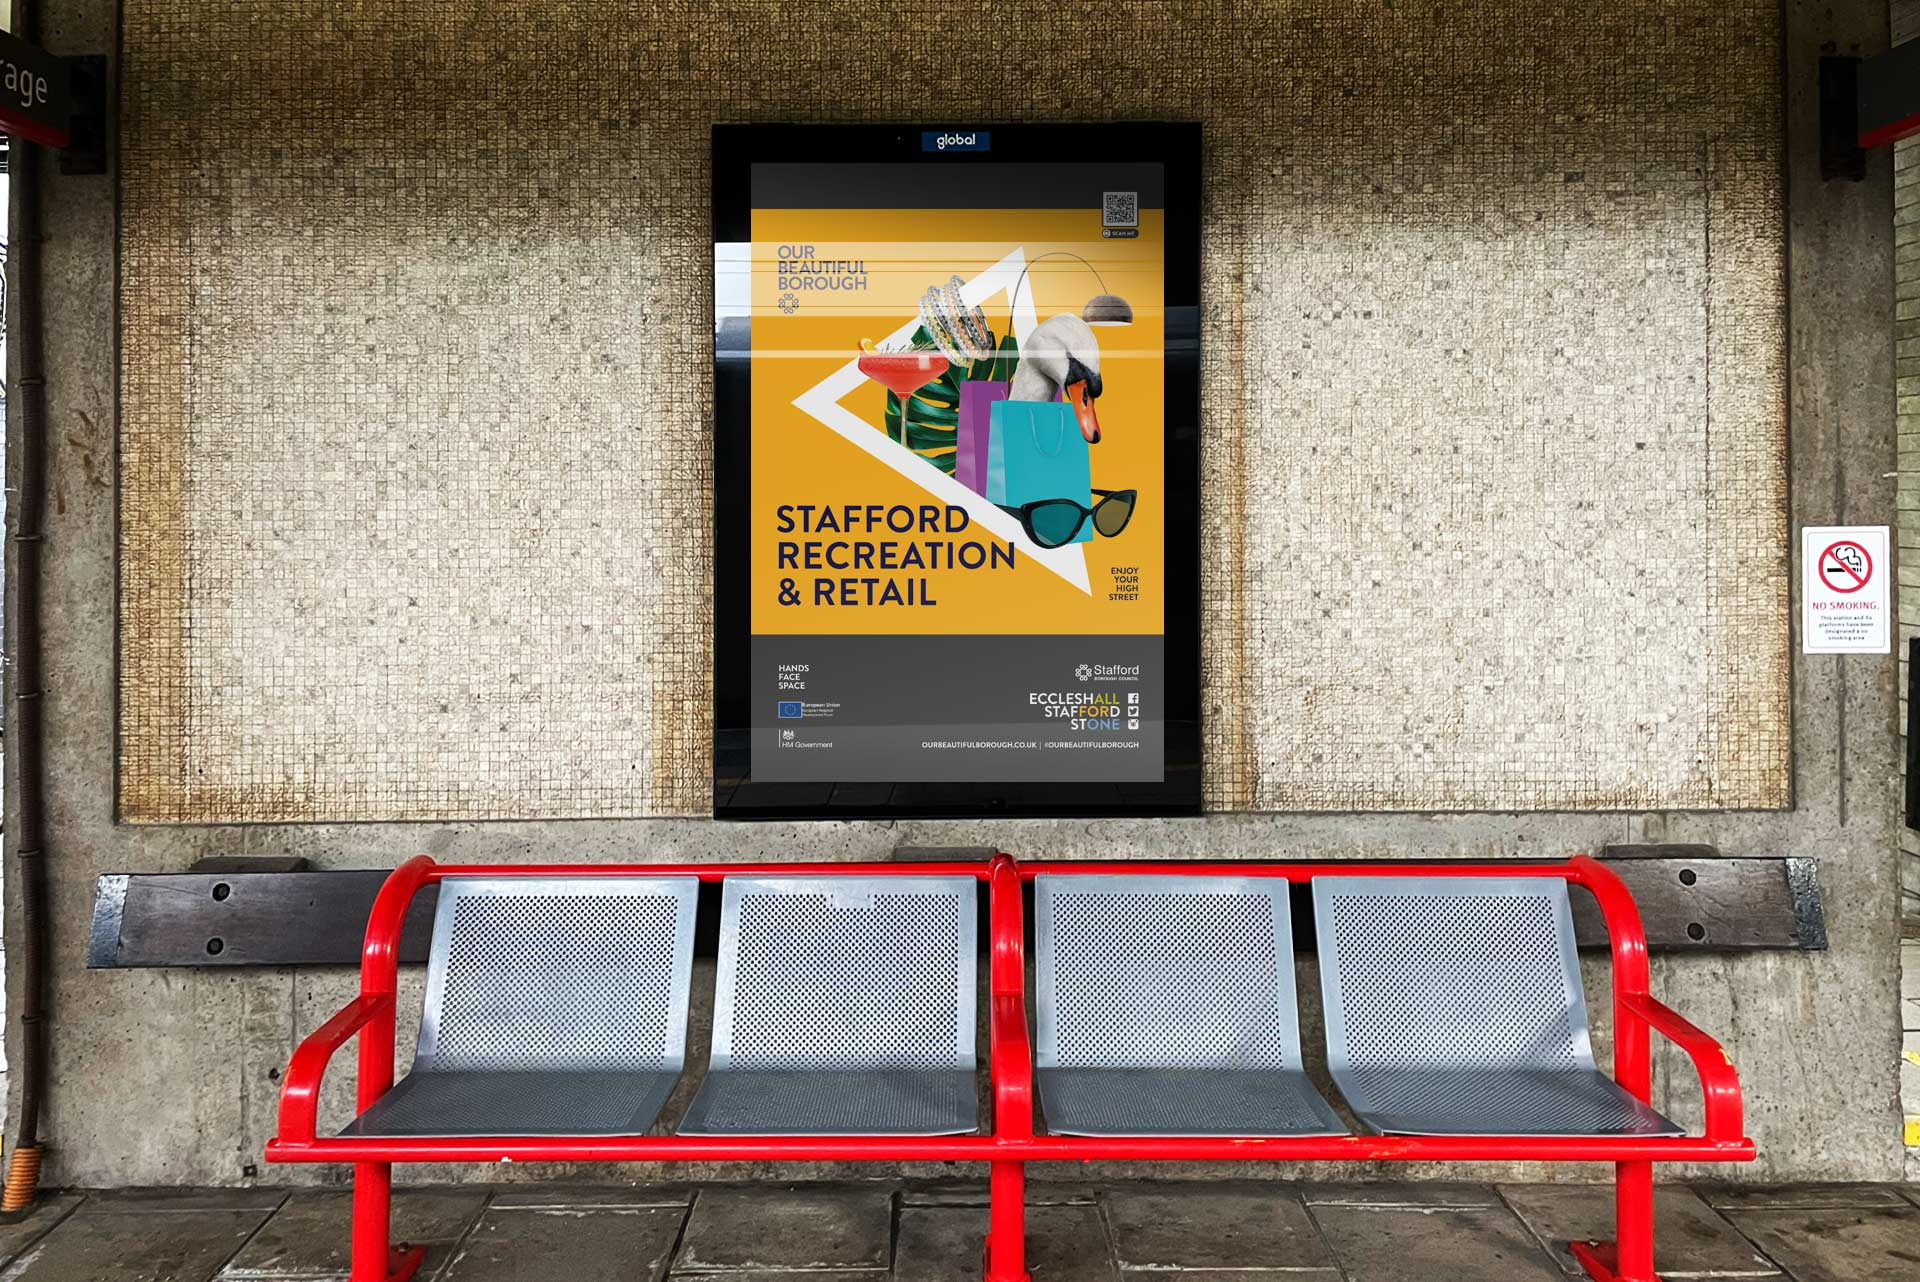 Advert at Stafford Railway Station